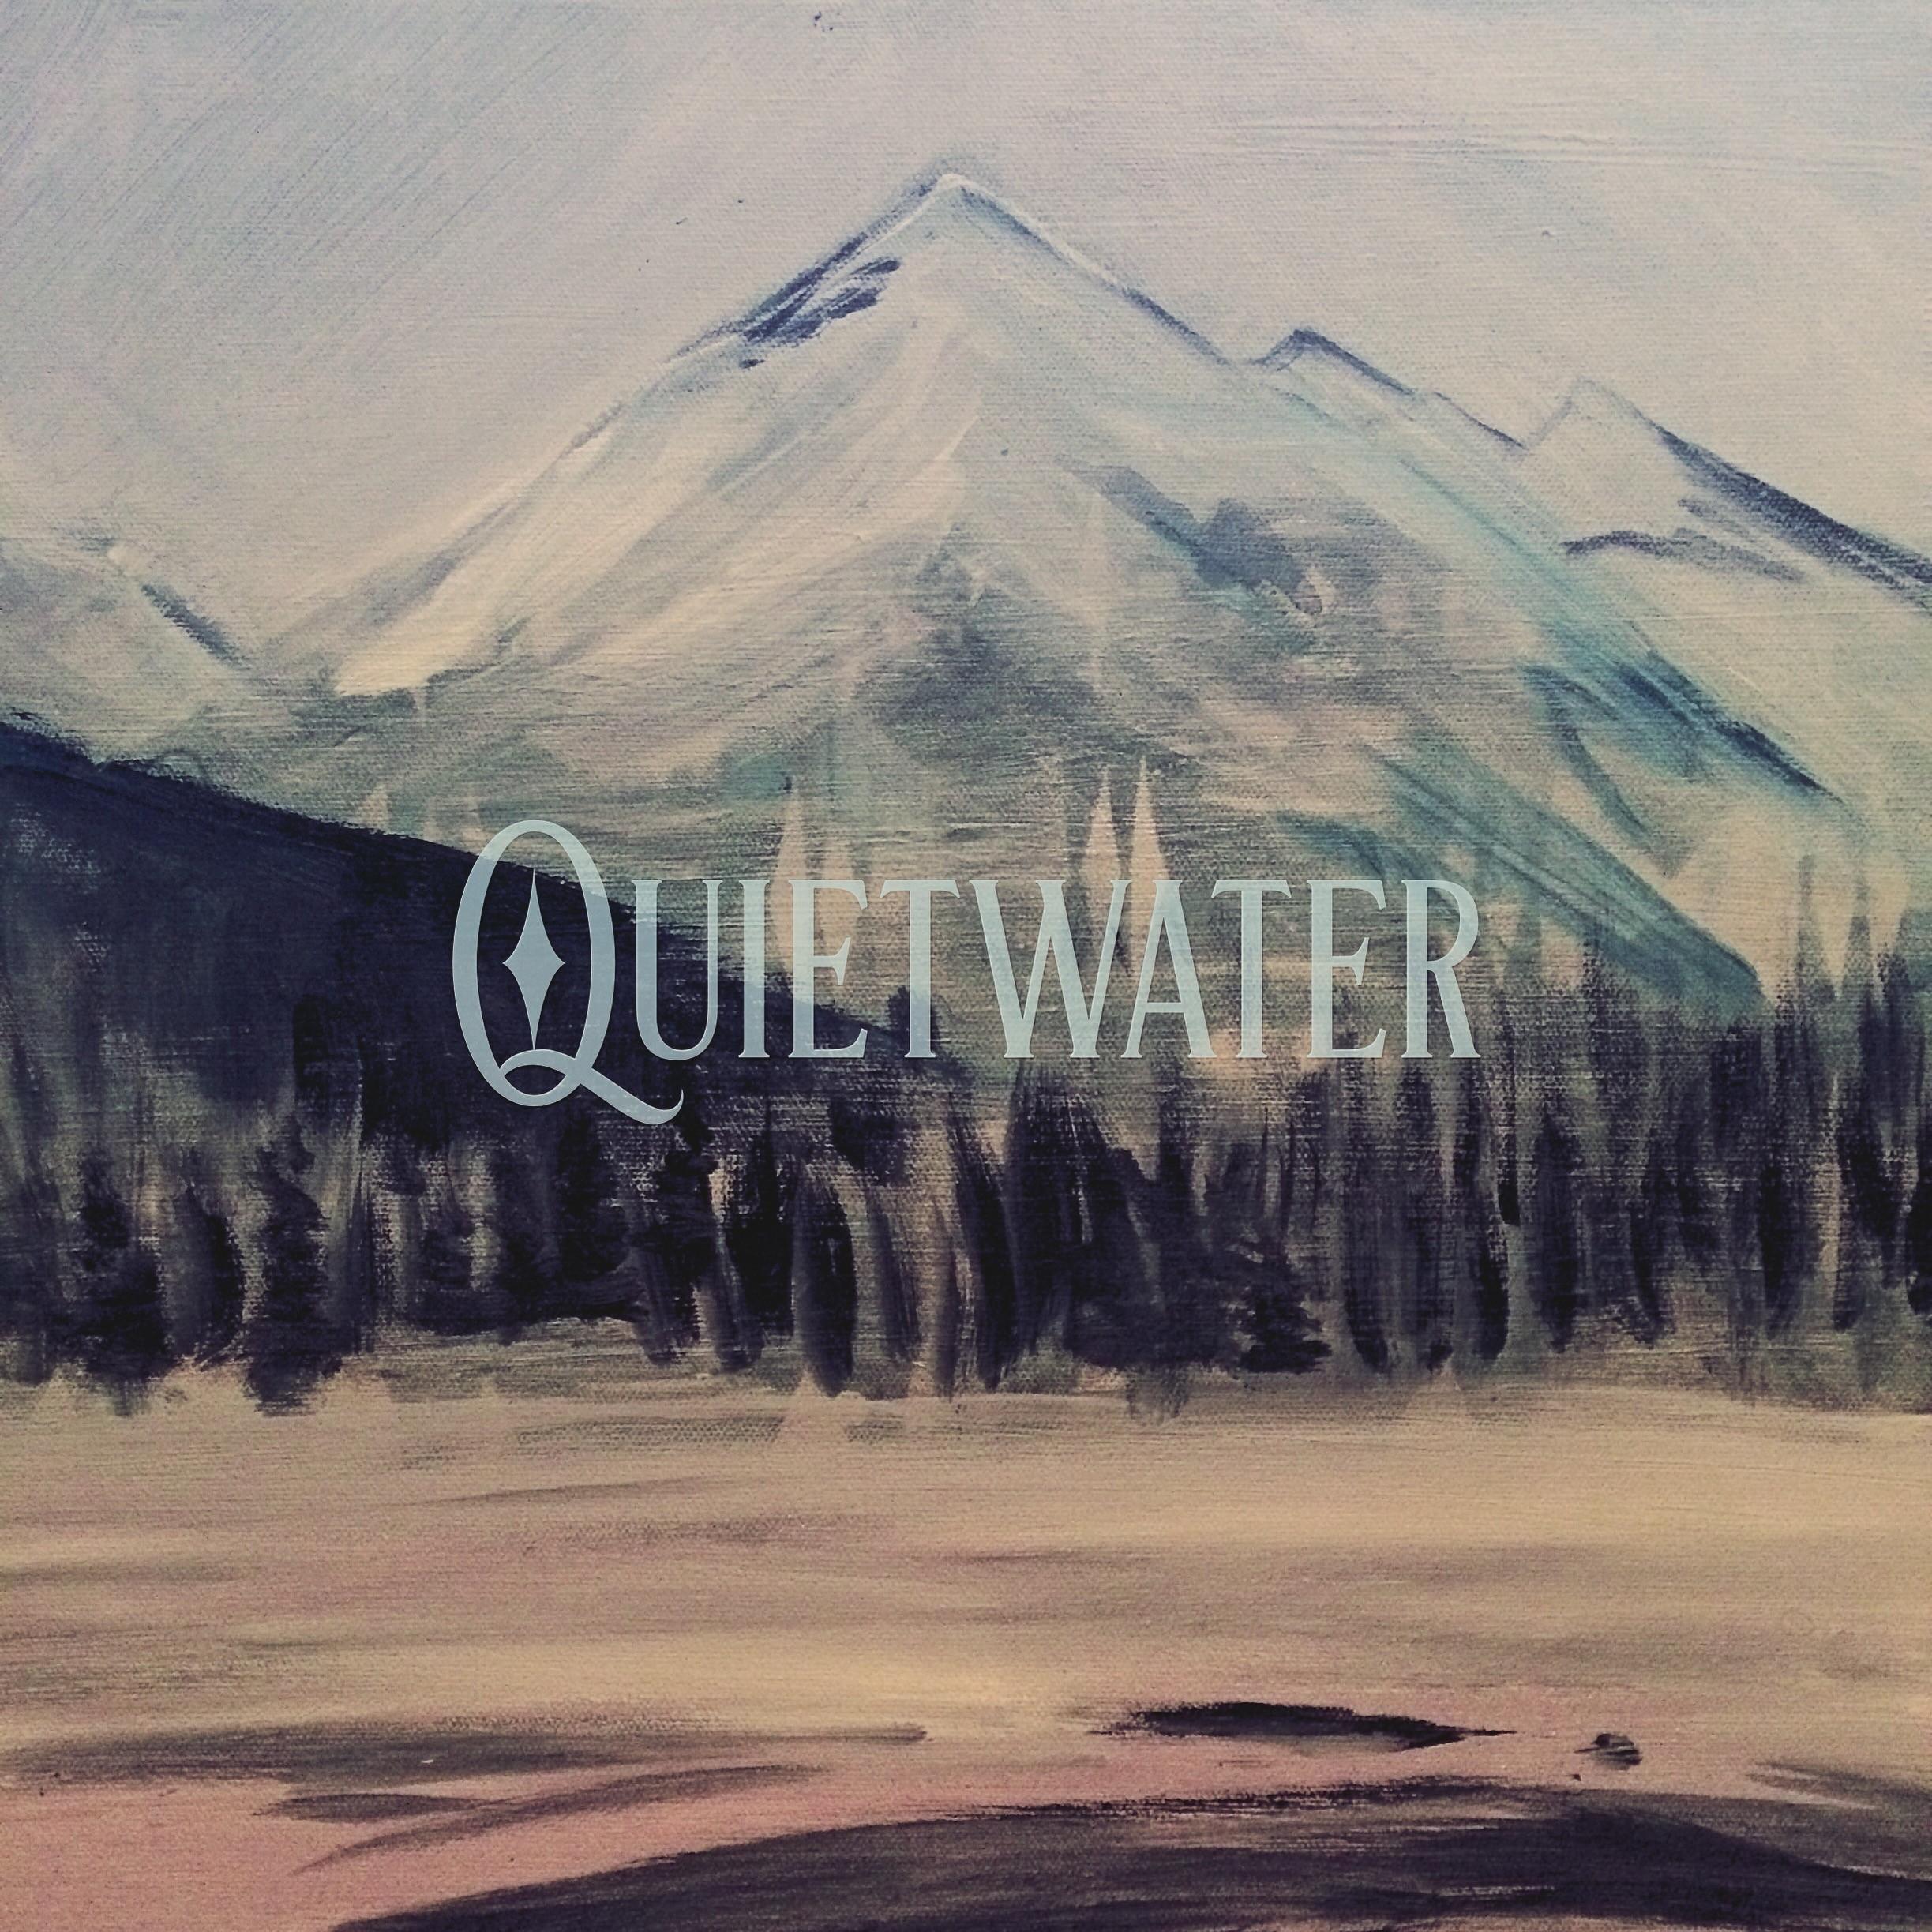 Quietwater